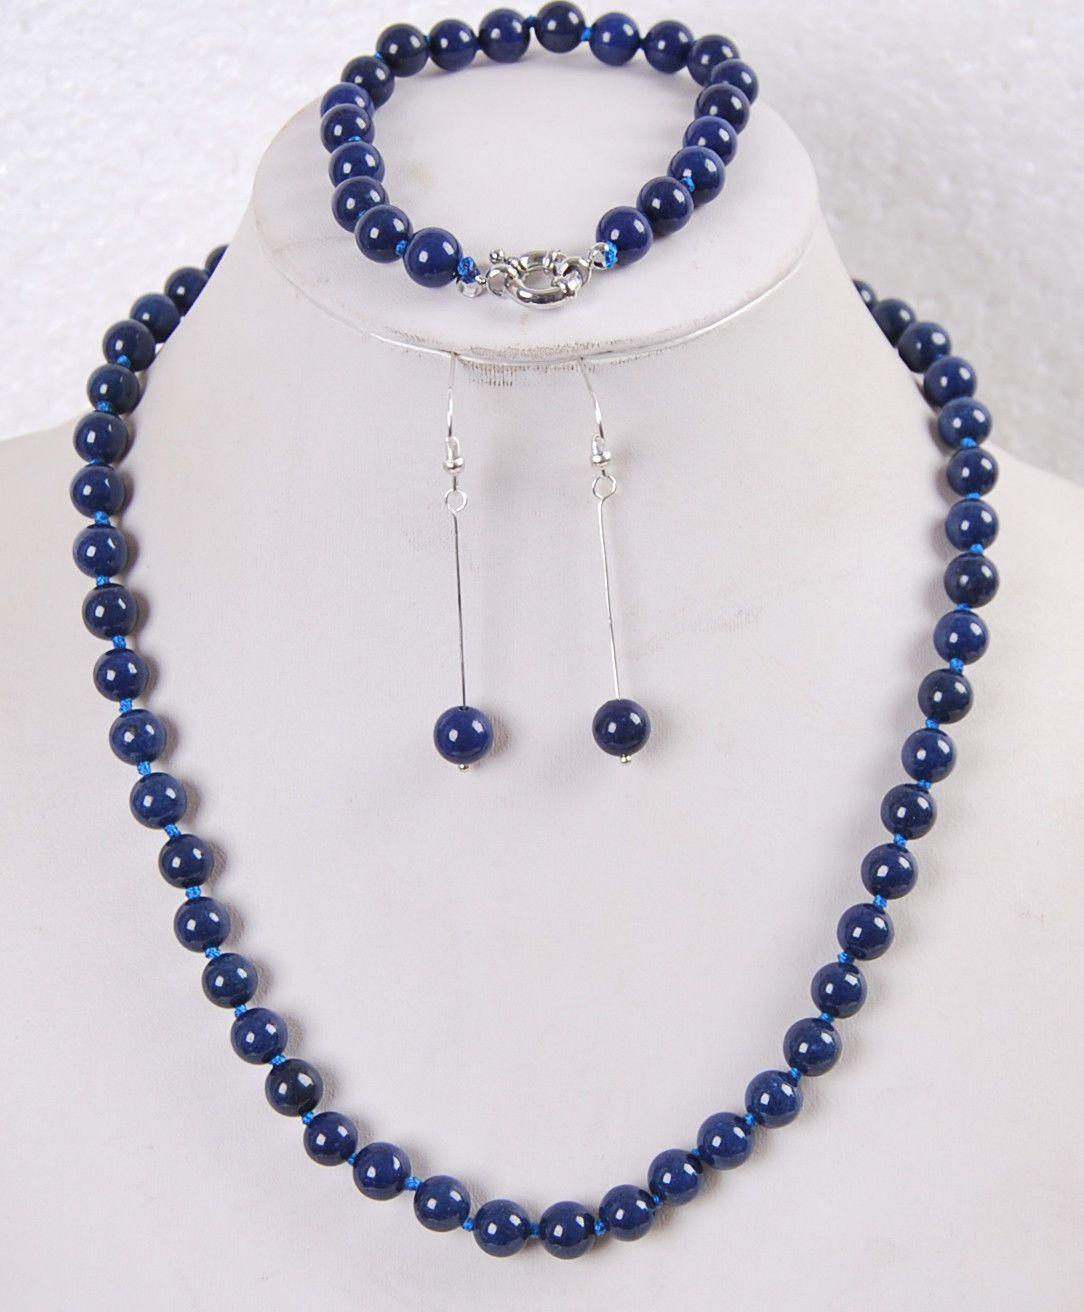 FFREE NAKLIYE ** 8mm Lapis Lazuli Yuvarlak Boncuk Kolye Bilezik Küpe Takı seti